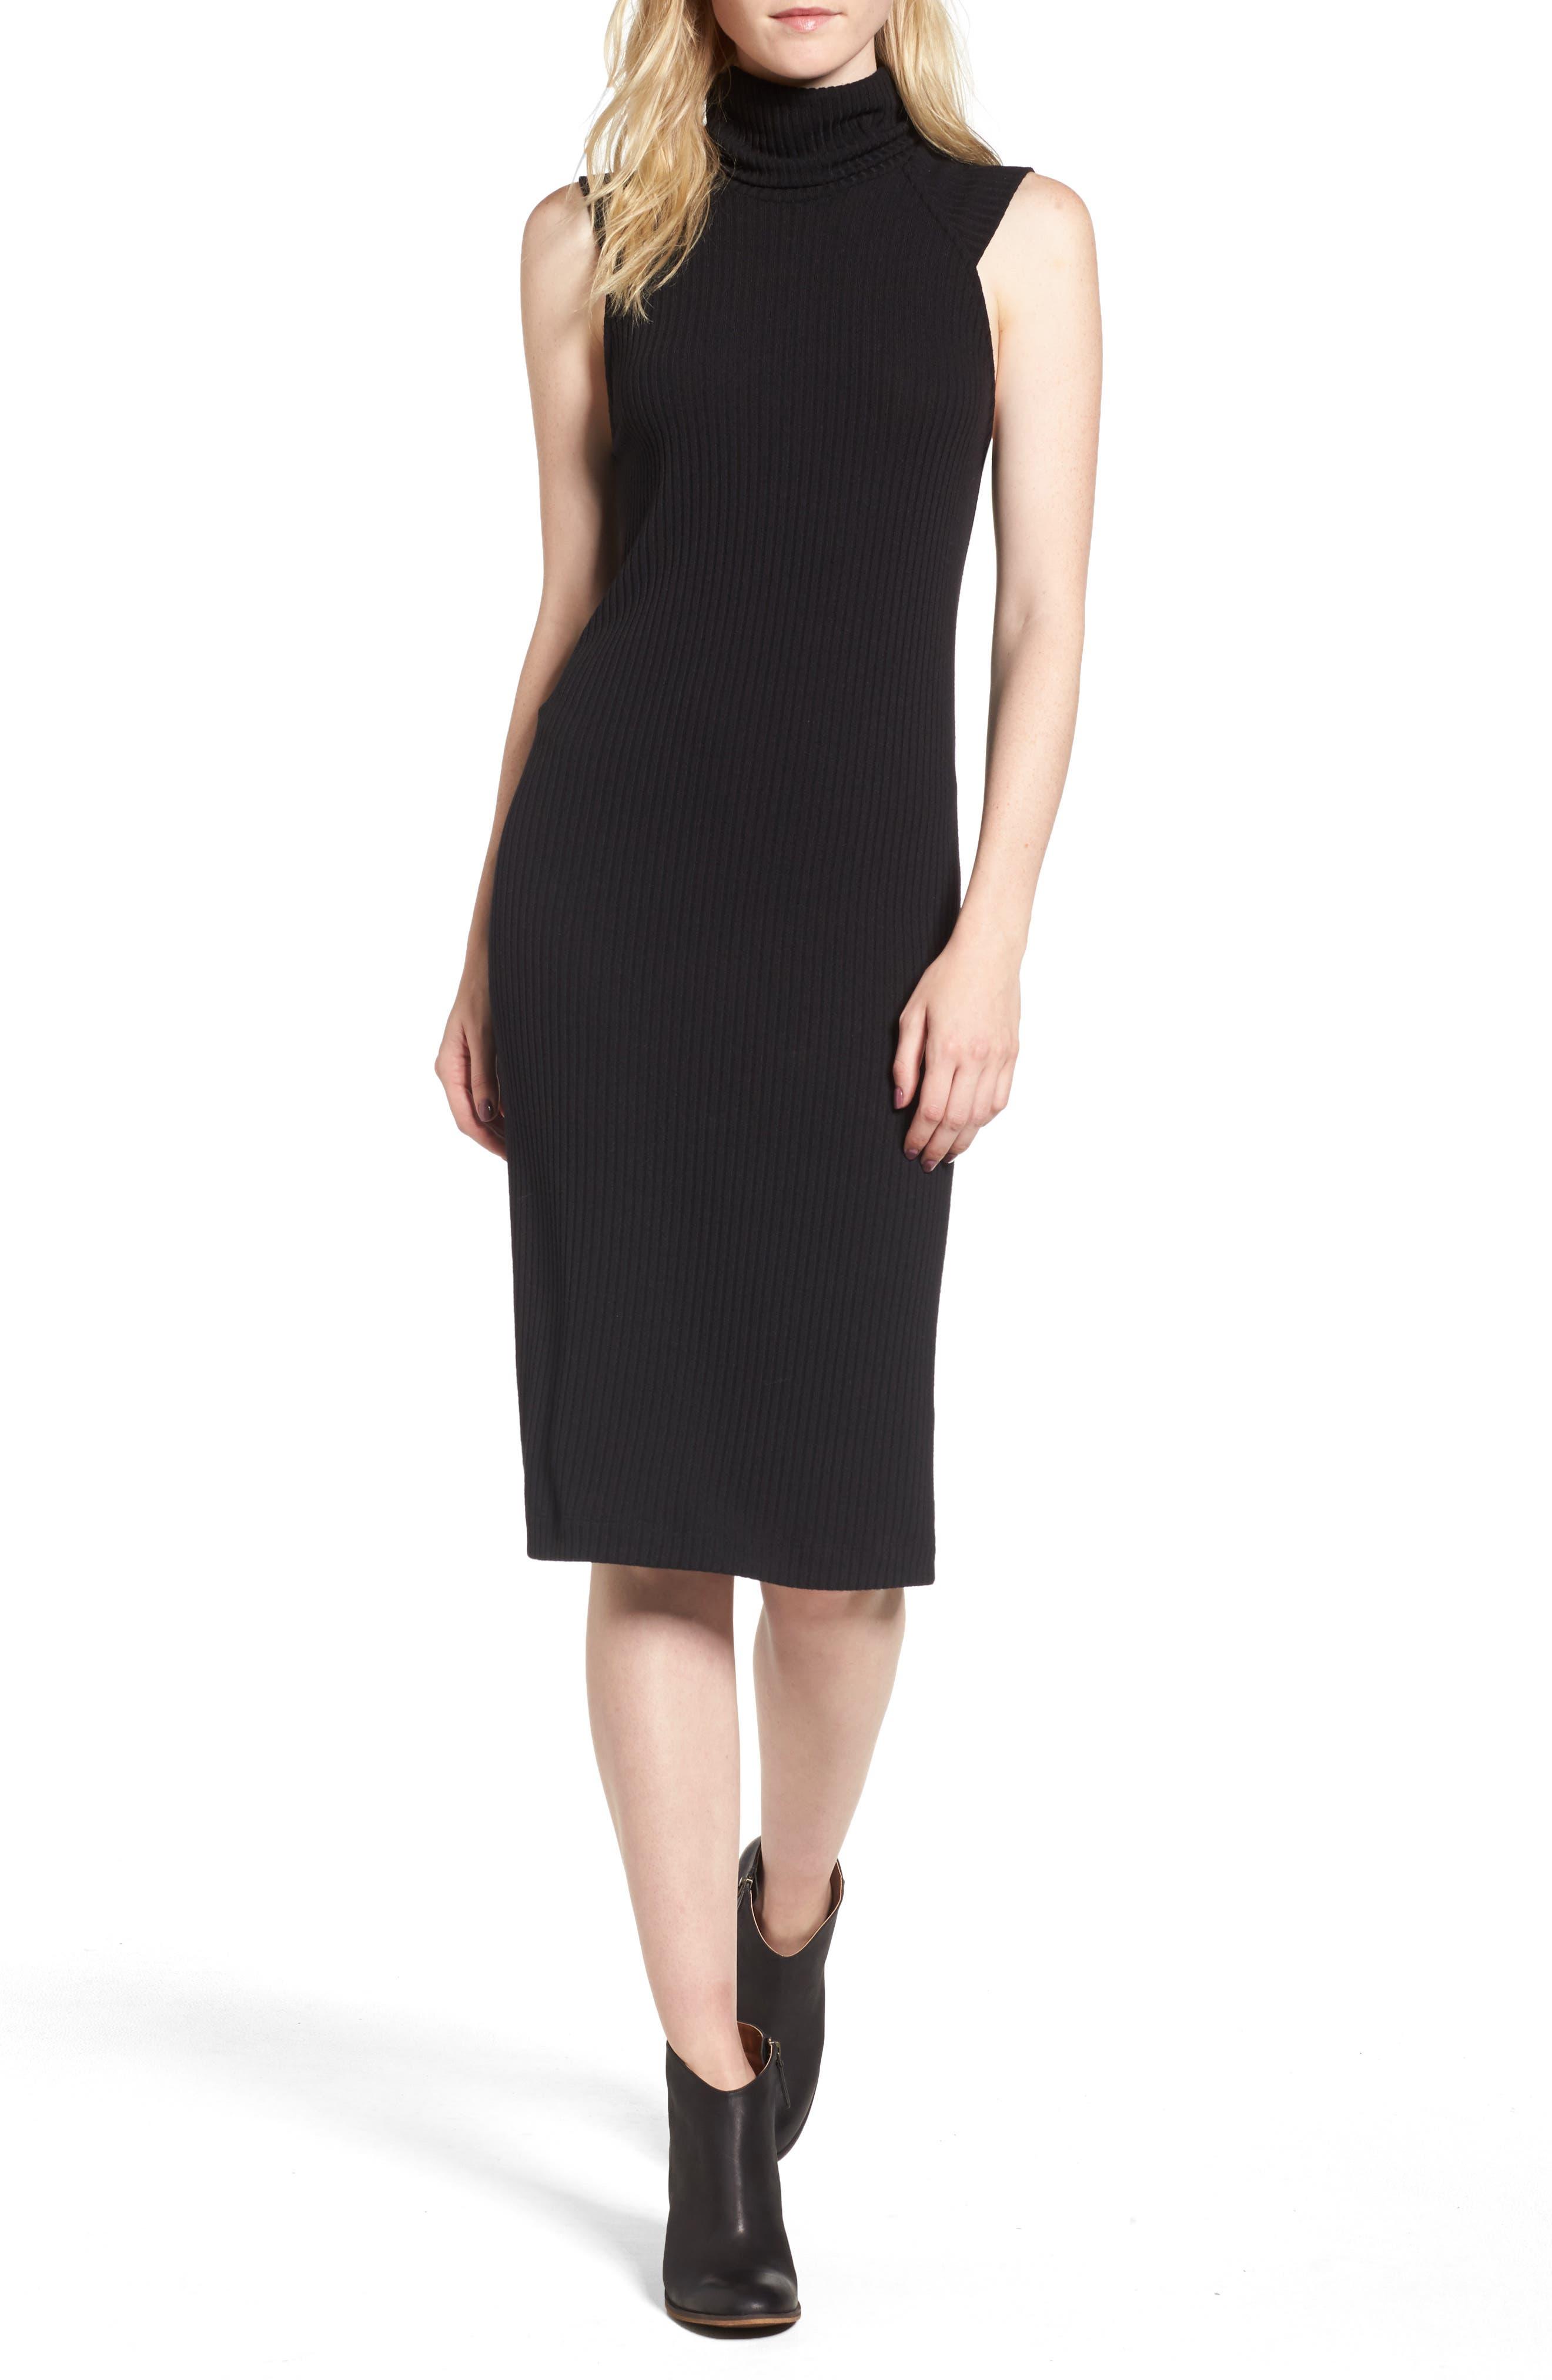 Alternate Image 1 Selected - Splendid Sylvie Rib Knit Dress